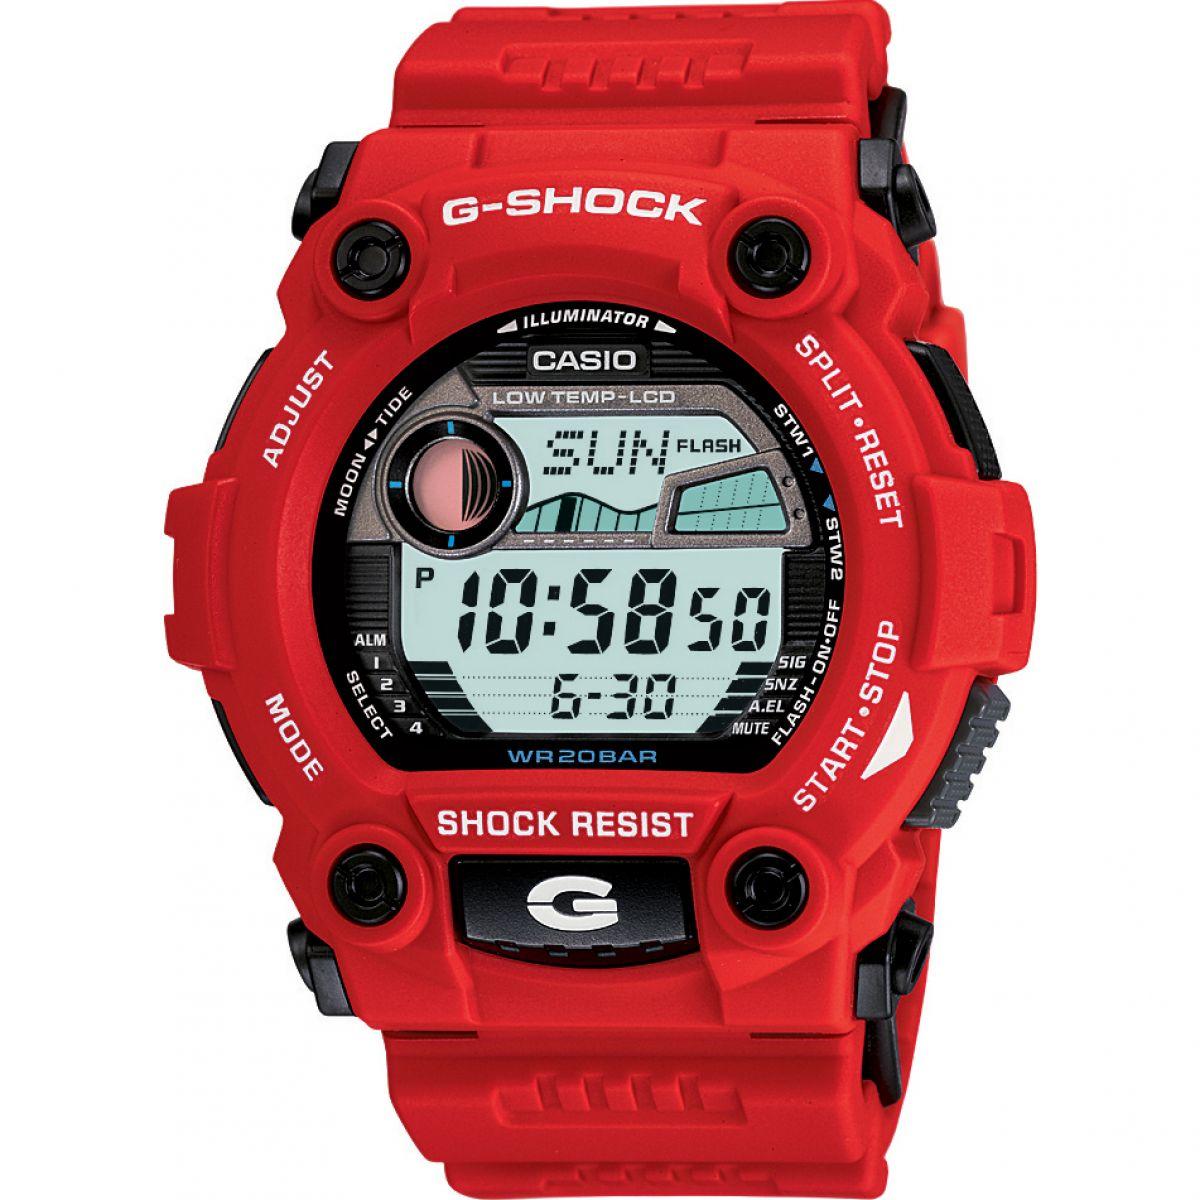 Gents Casio G-Shock G-Rescue Alarm Chronograph Watch (G-7900A-4ER)   WatchShop.com™